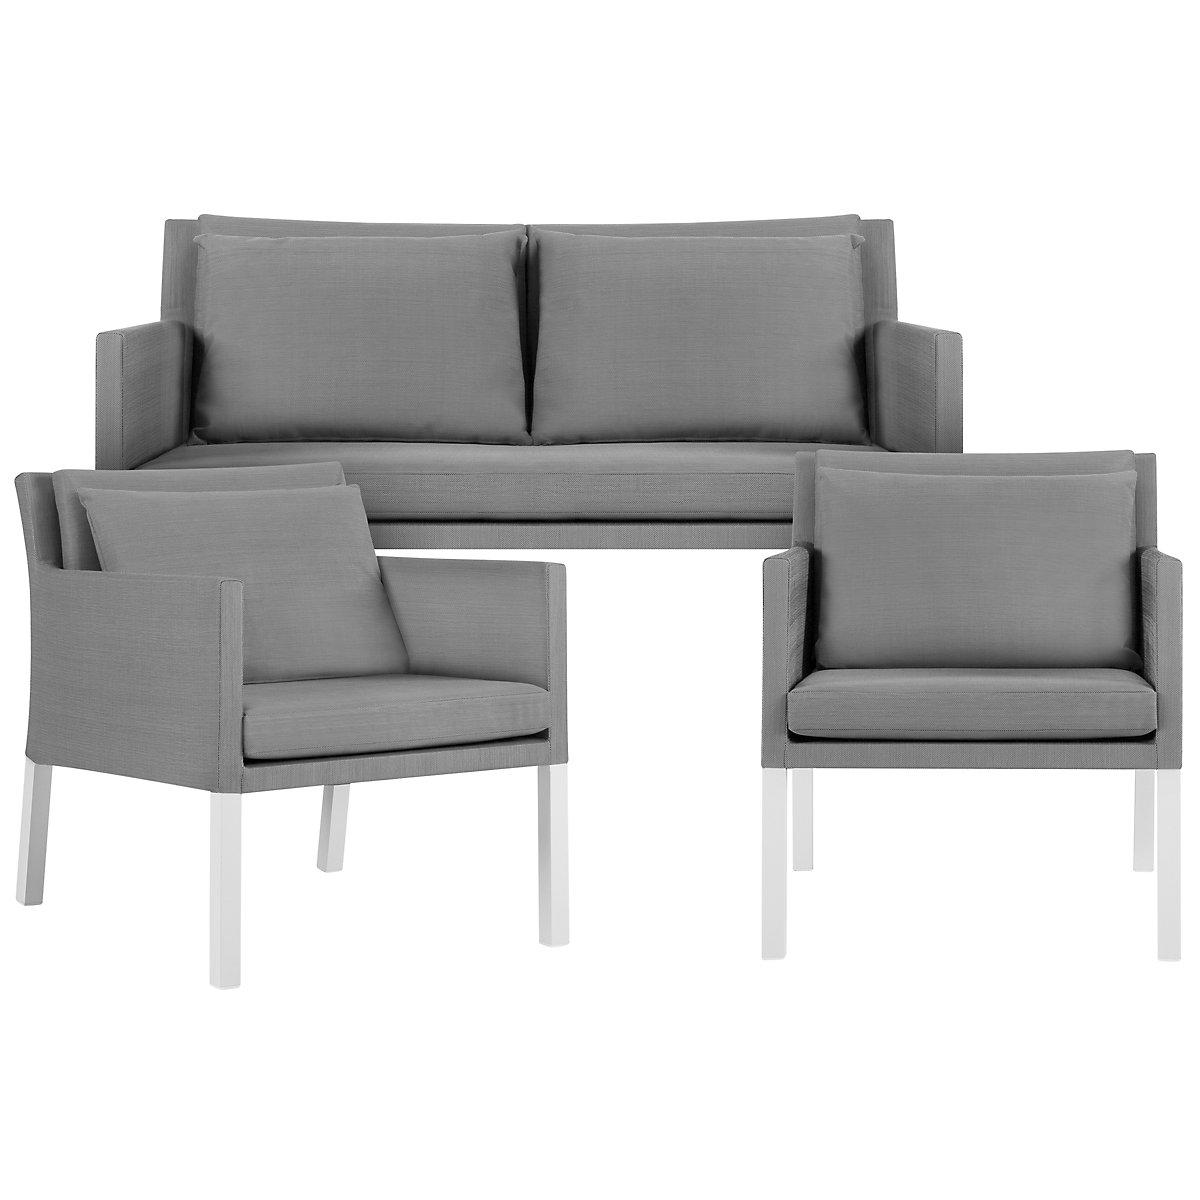 Outdoor Living Room Sets City Furniture Outdoor Furniture Patio Living Room Sets